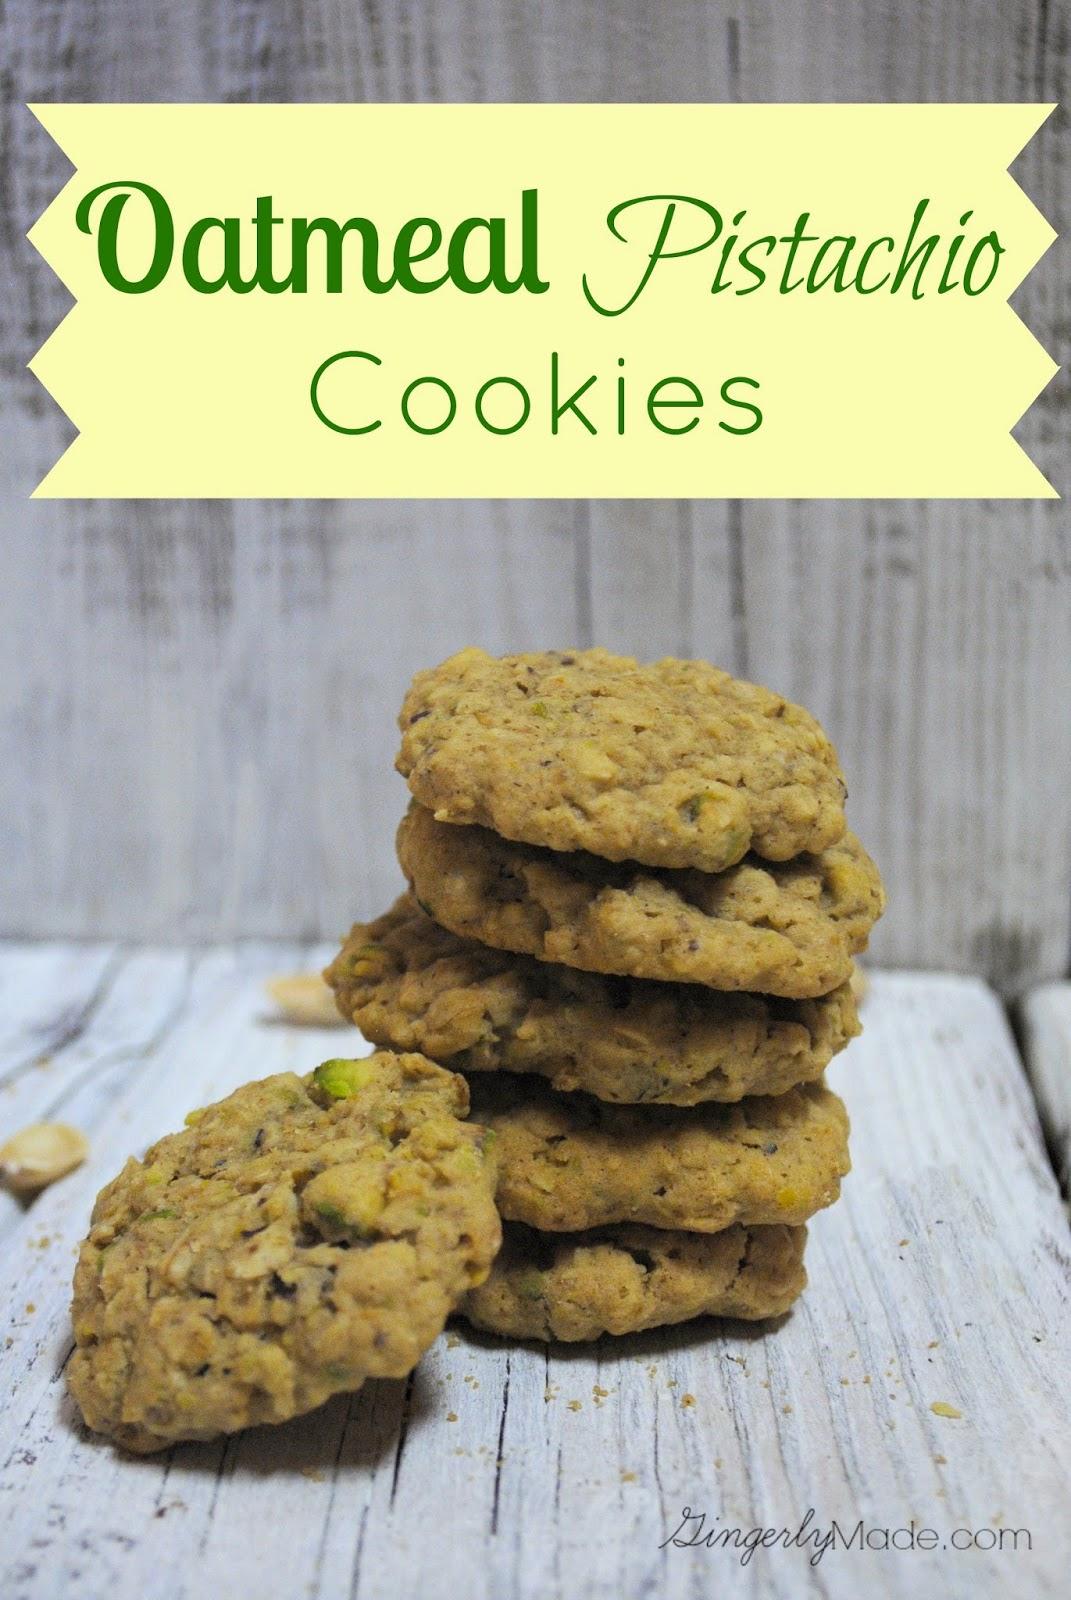 Oatmeal Pistachio Cookie